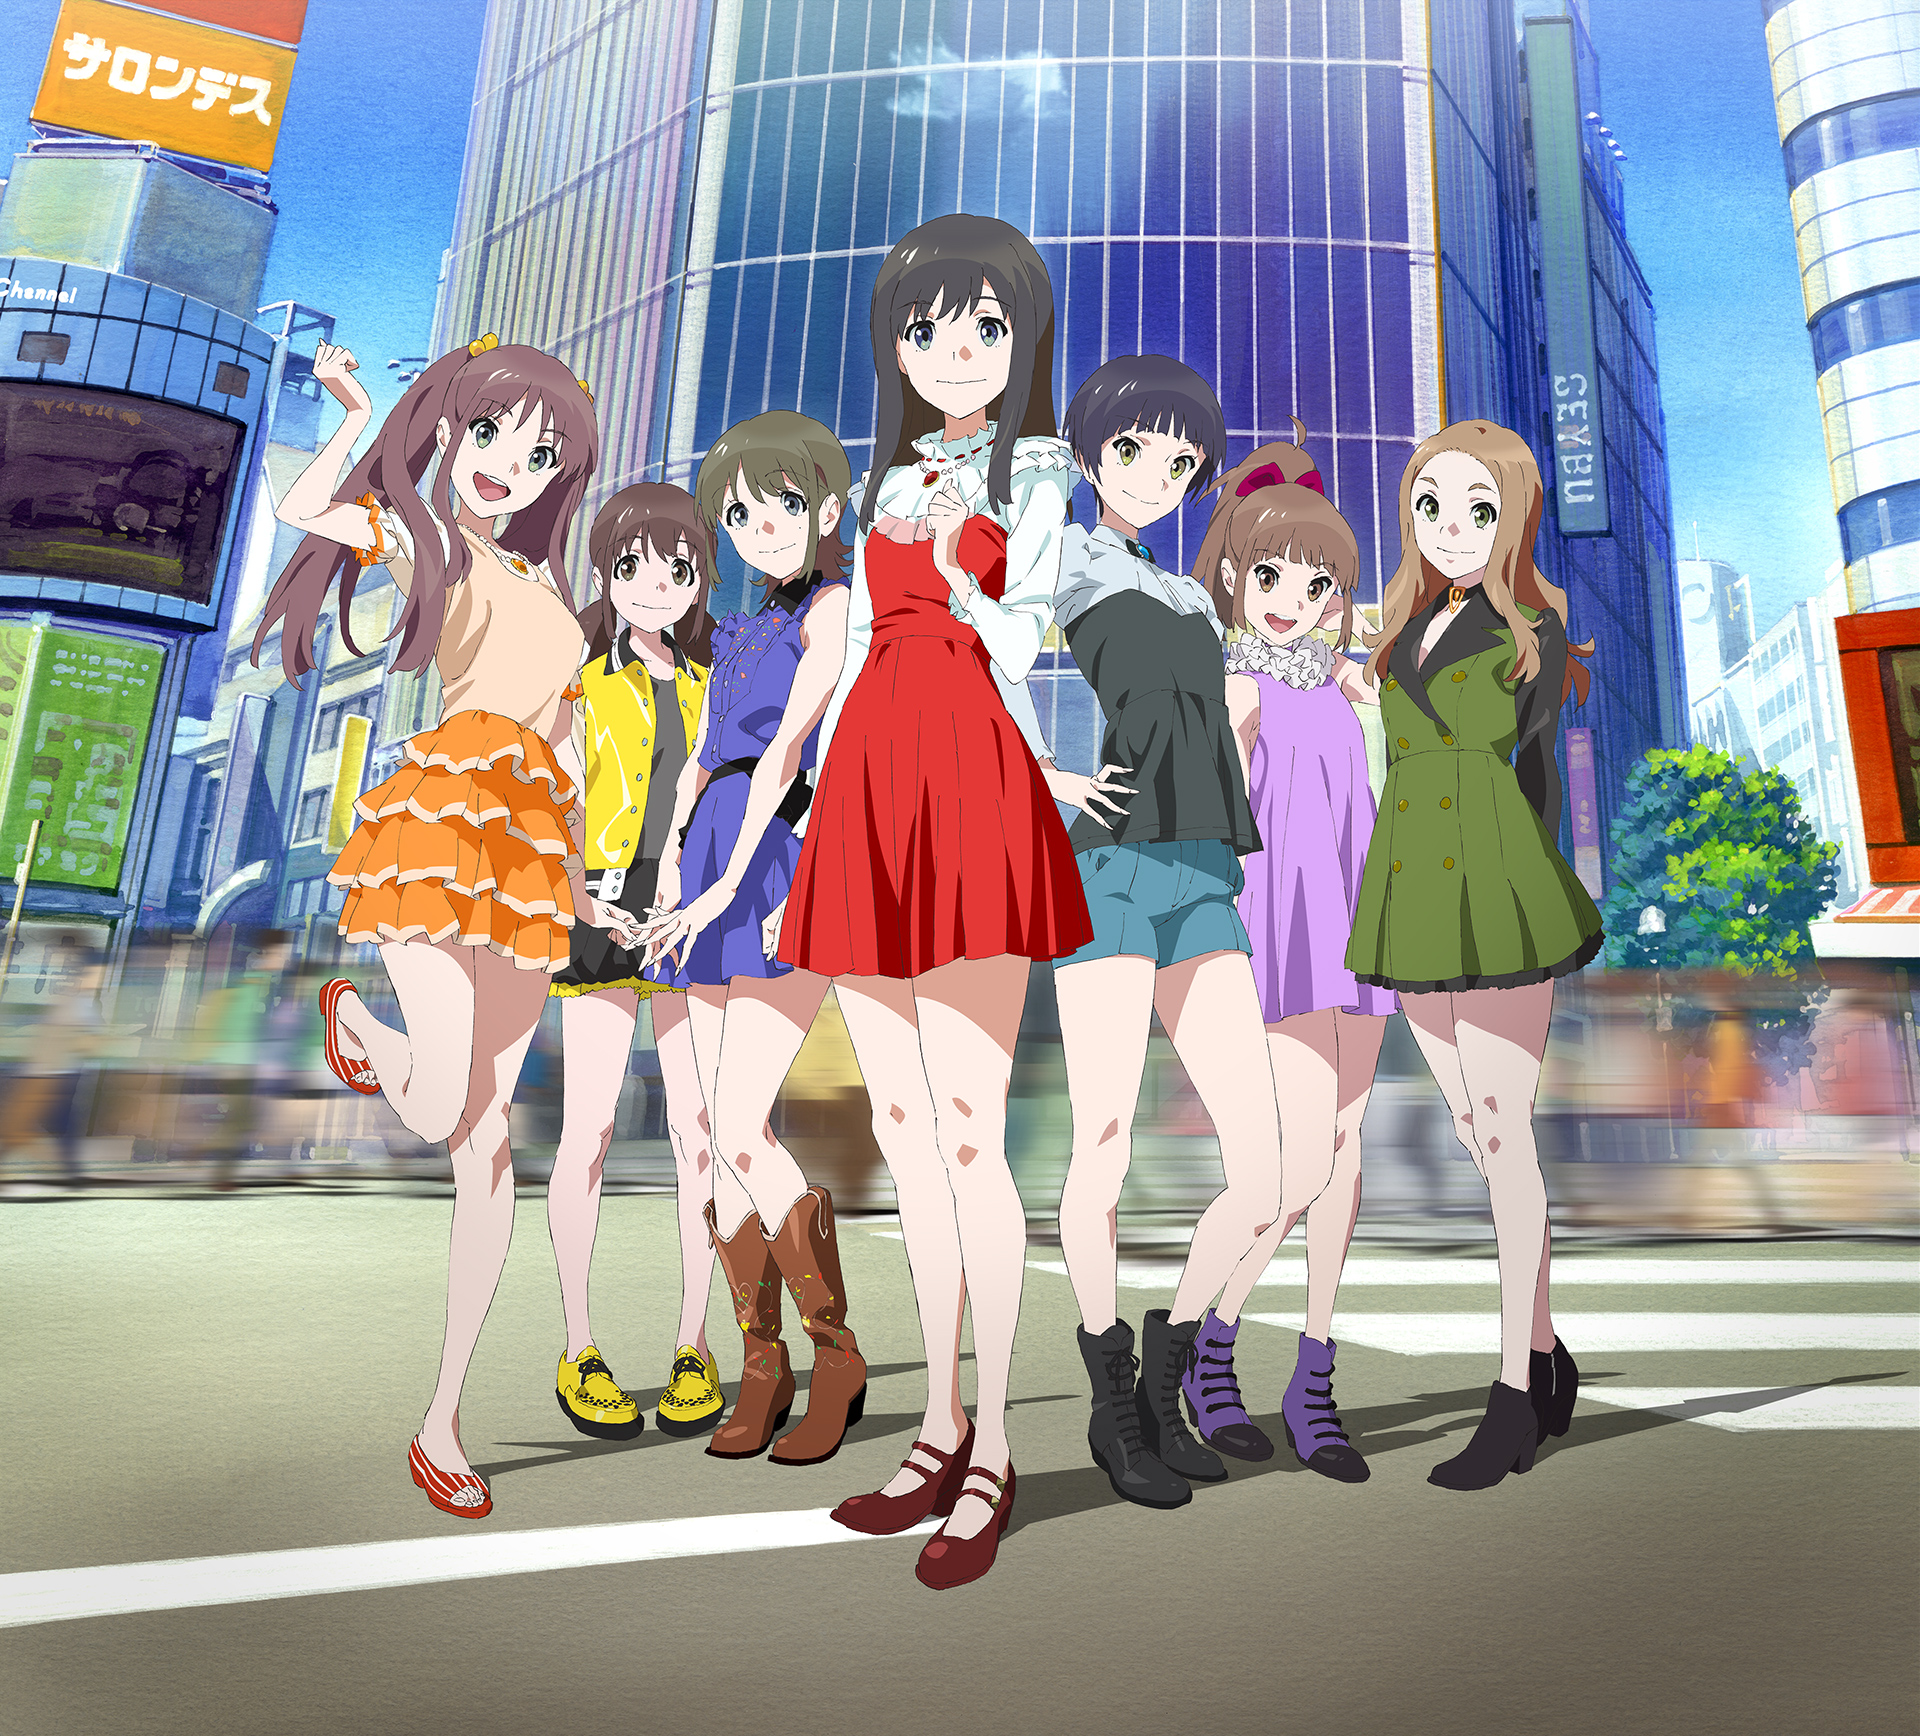 Second Wake up Girls! Movie Announced for 2015 Visual haruhichan.com Wake Up Girls Film 2015